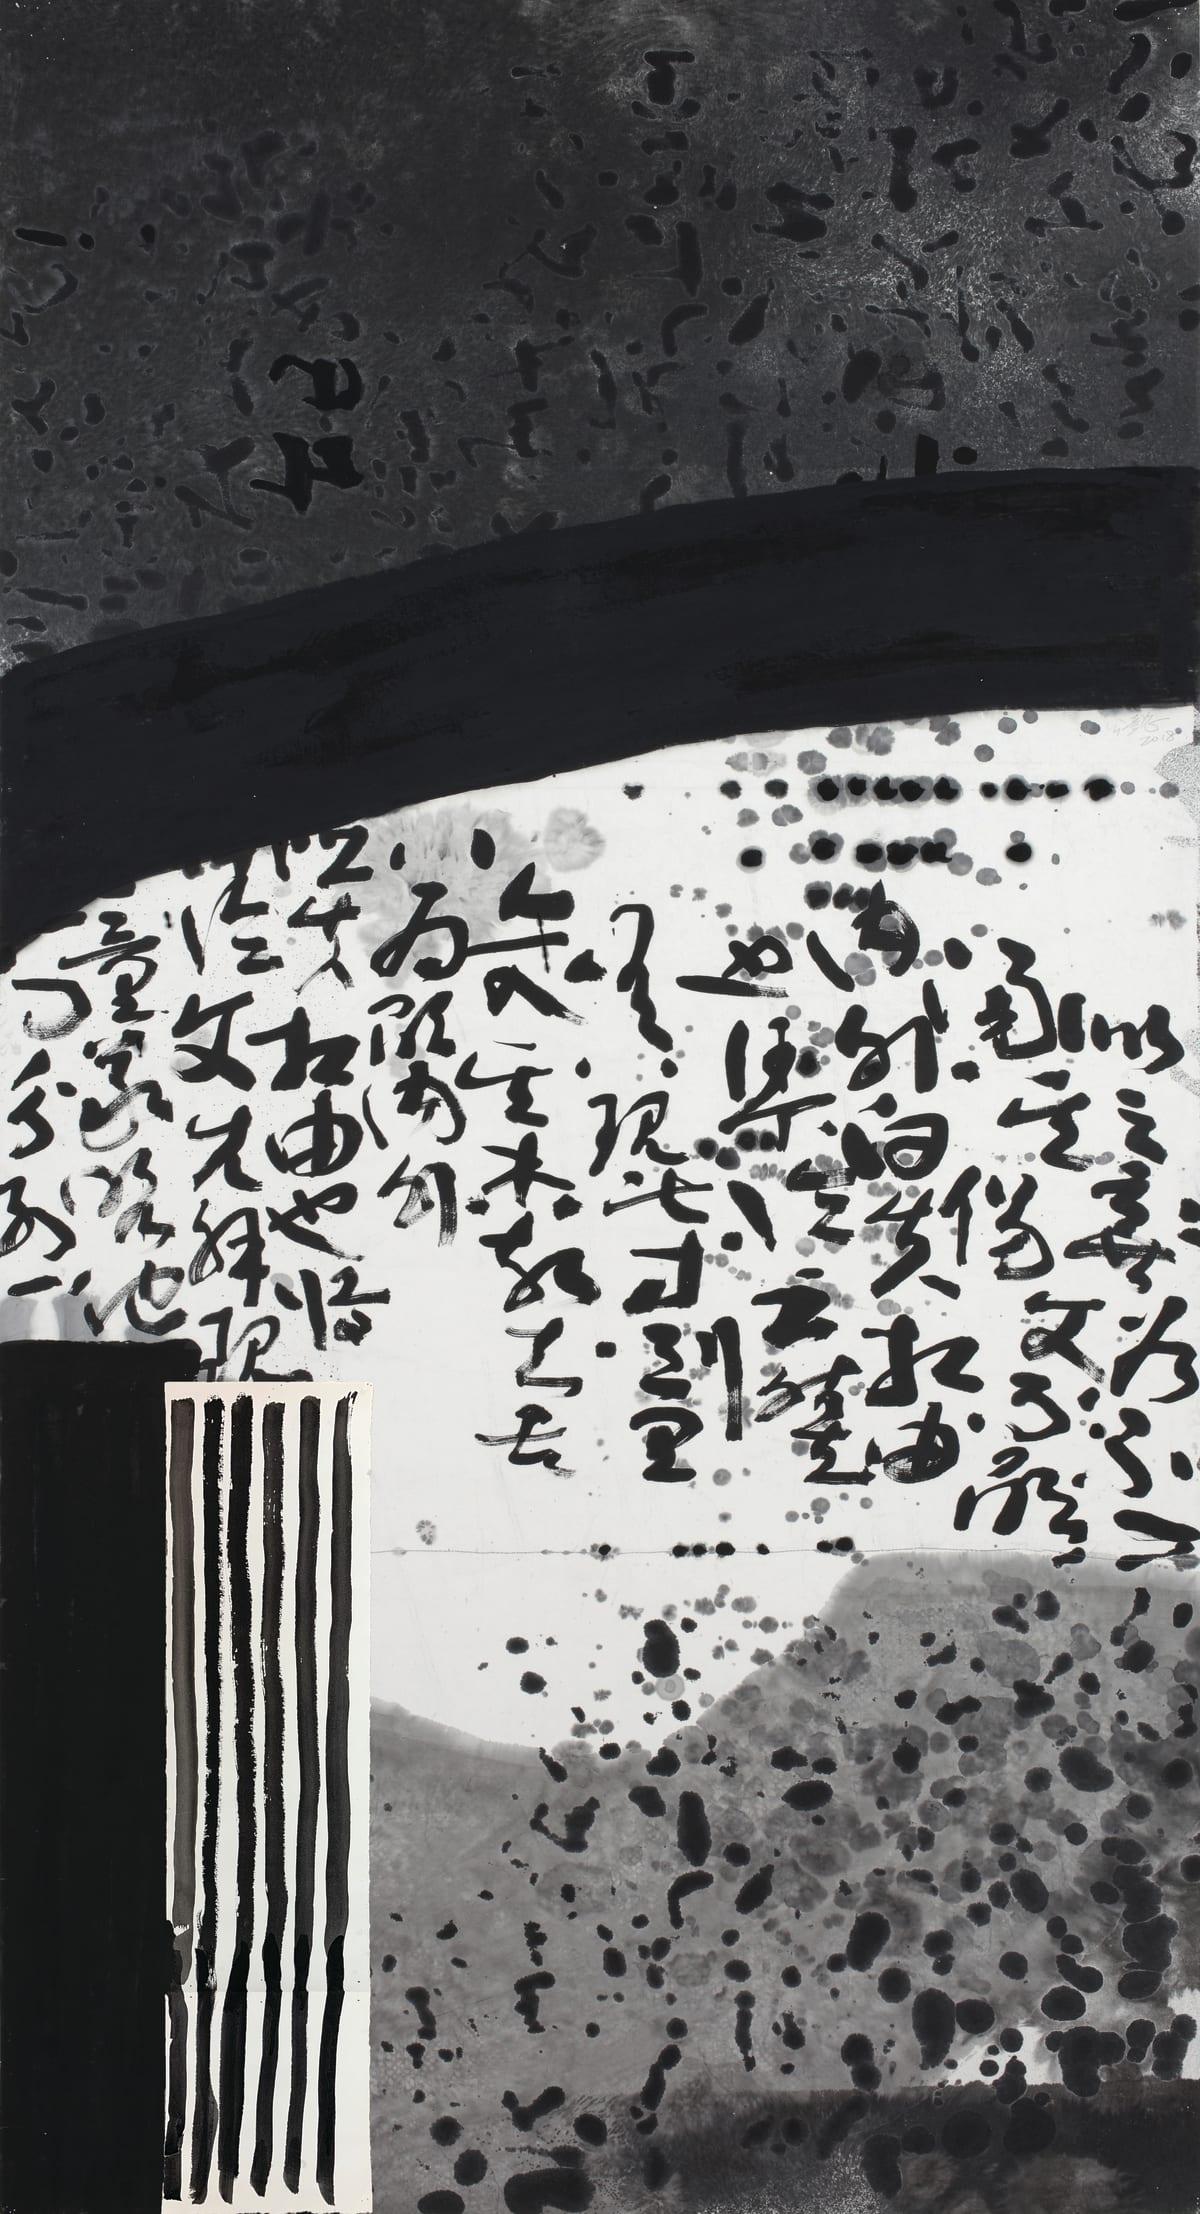 Wang Gongyi 王公懿, Order, Disorder 有序·無序, 2018